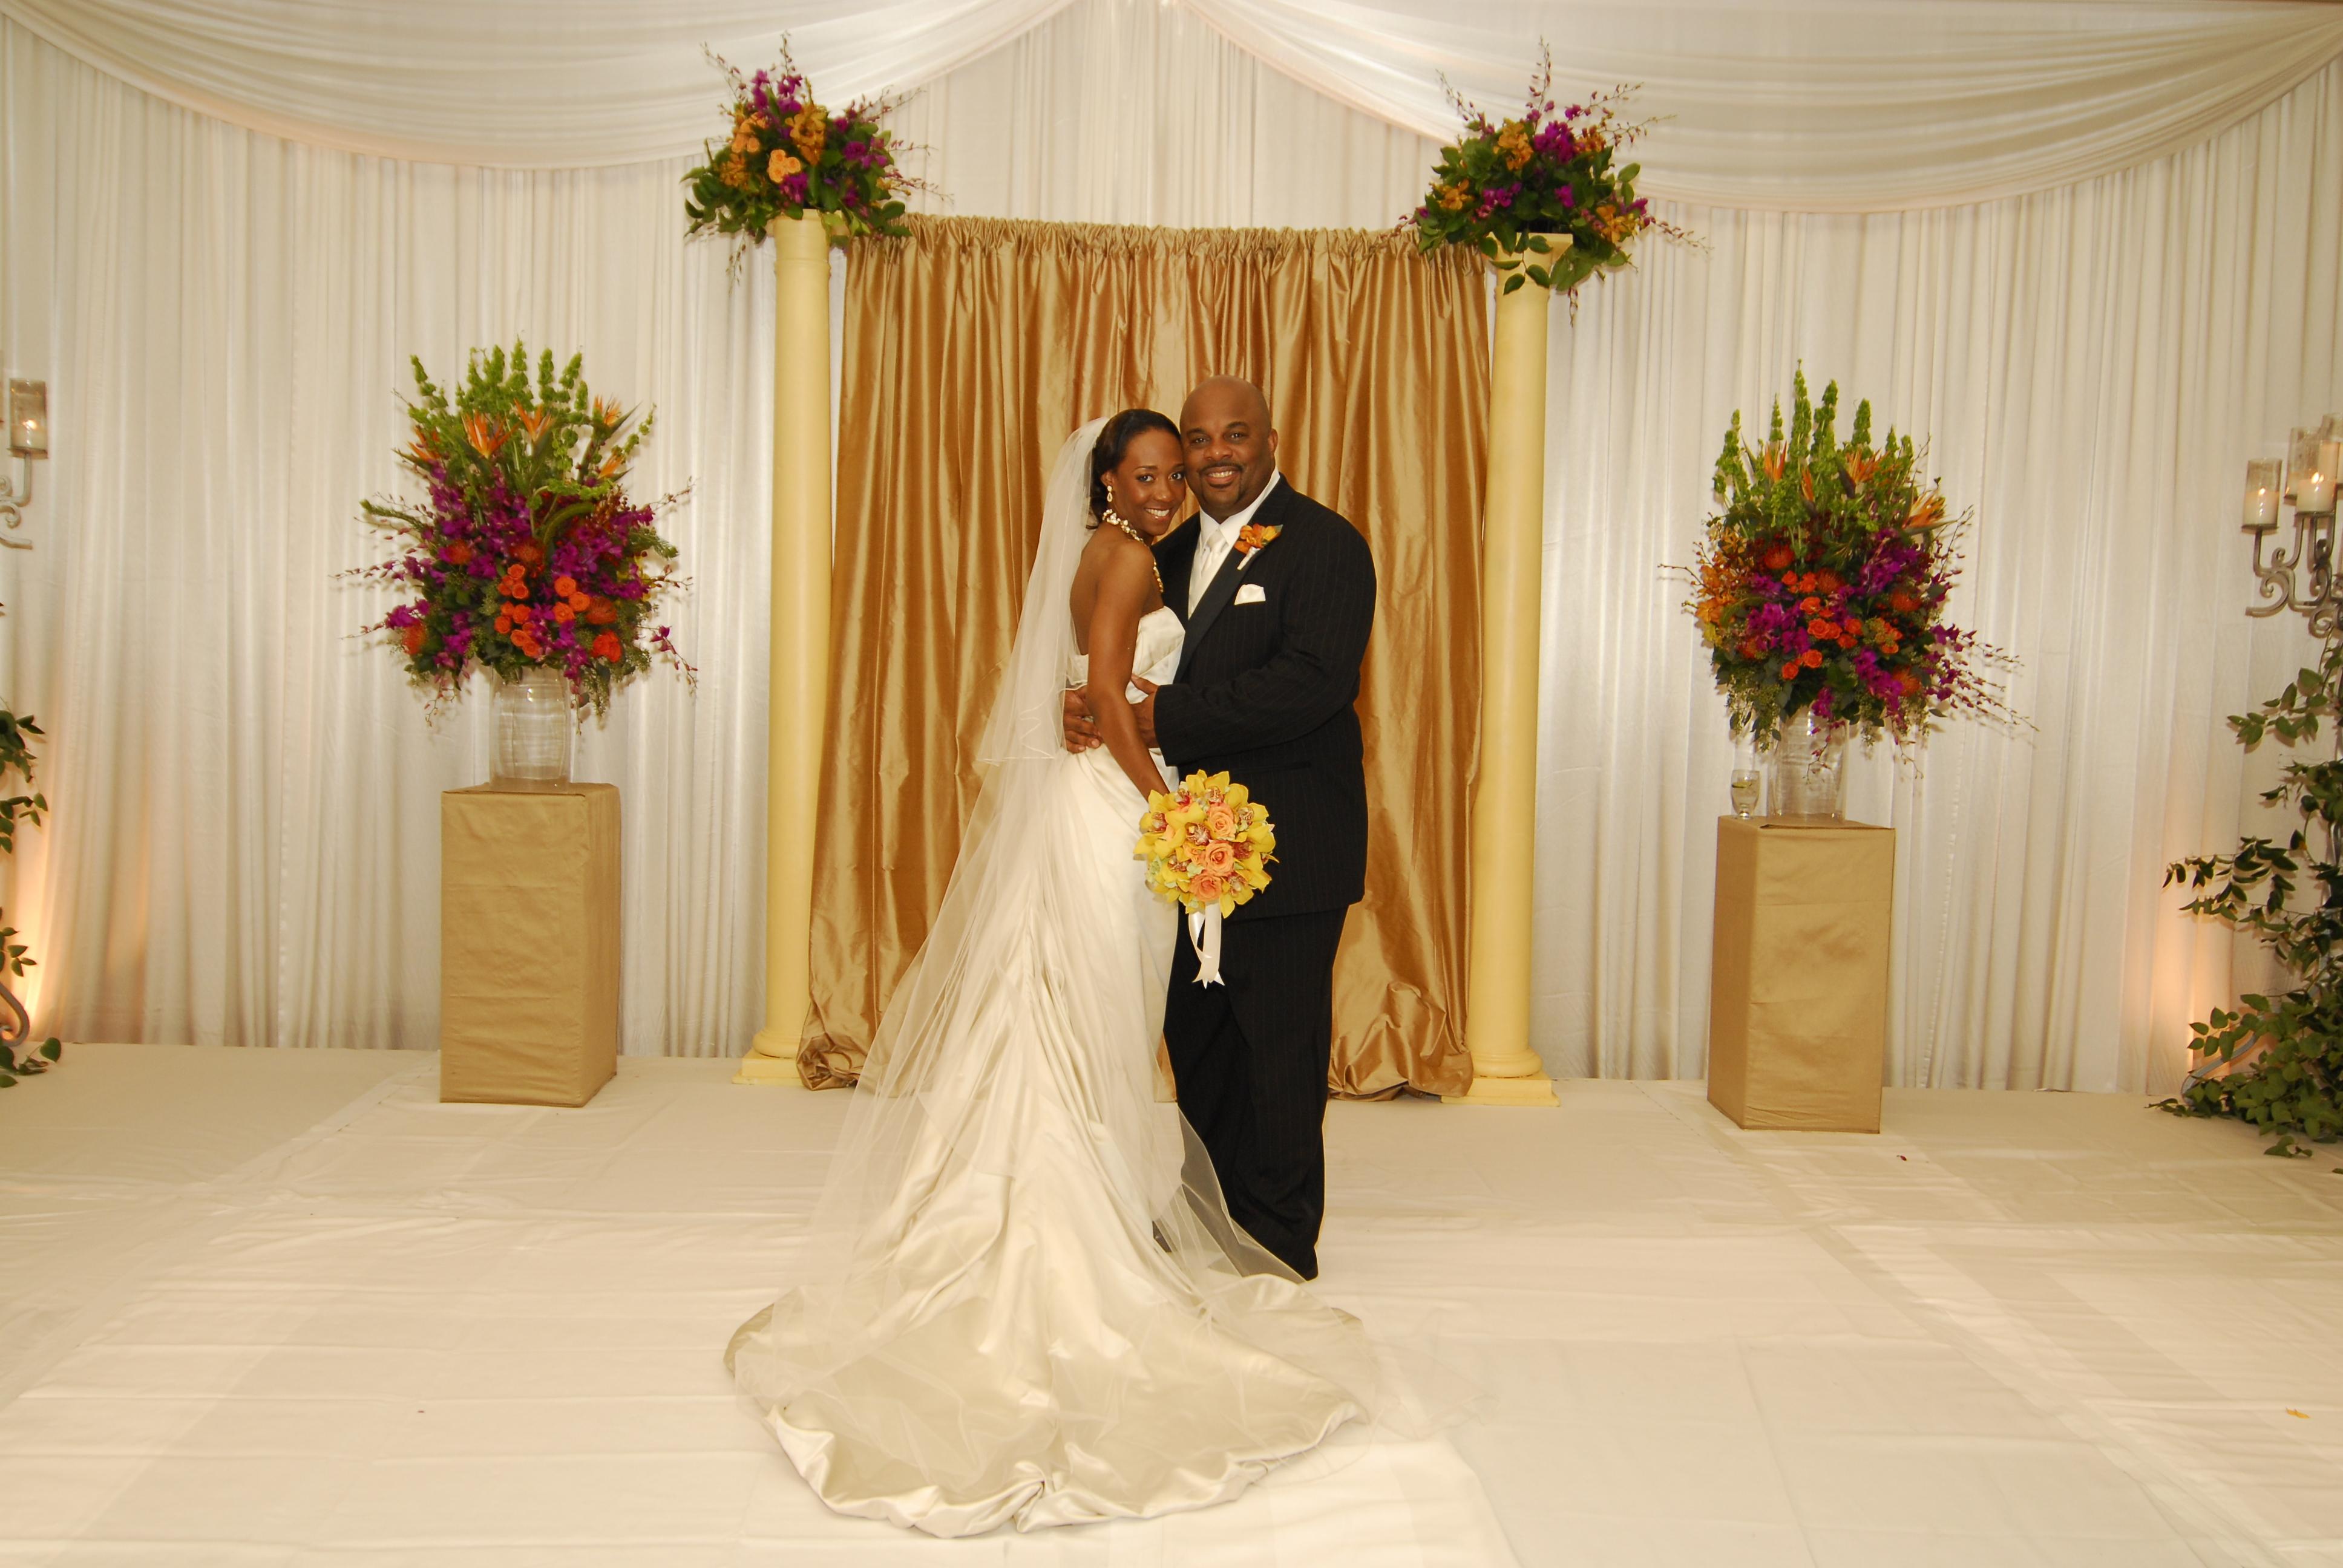 Center, Hilton, Lincoln, Dallas, Weddings of elegance